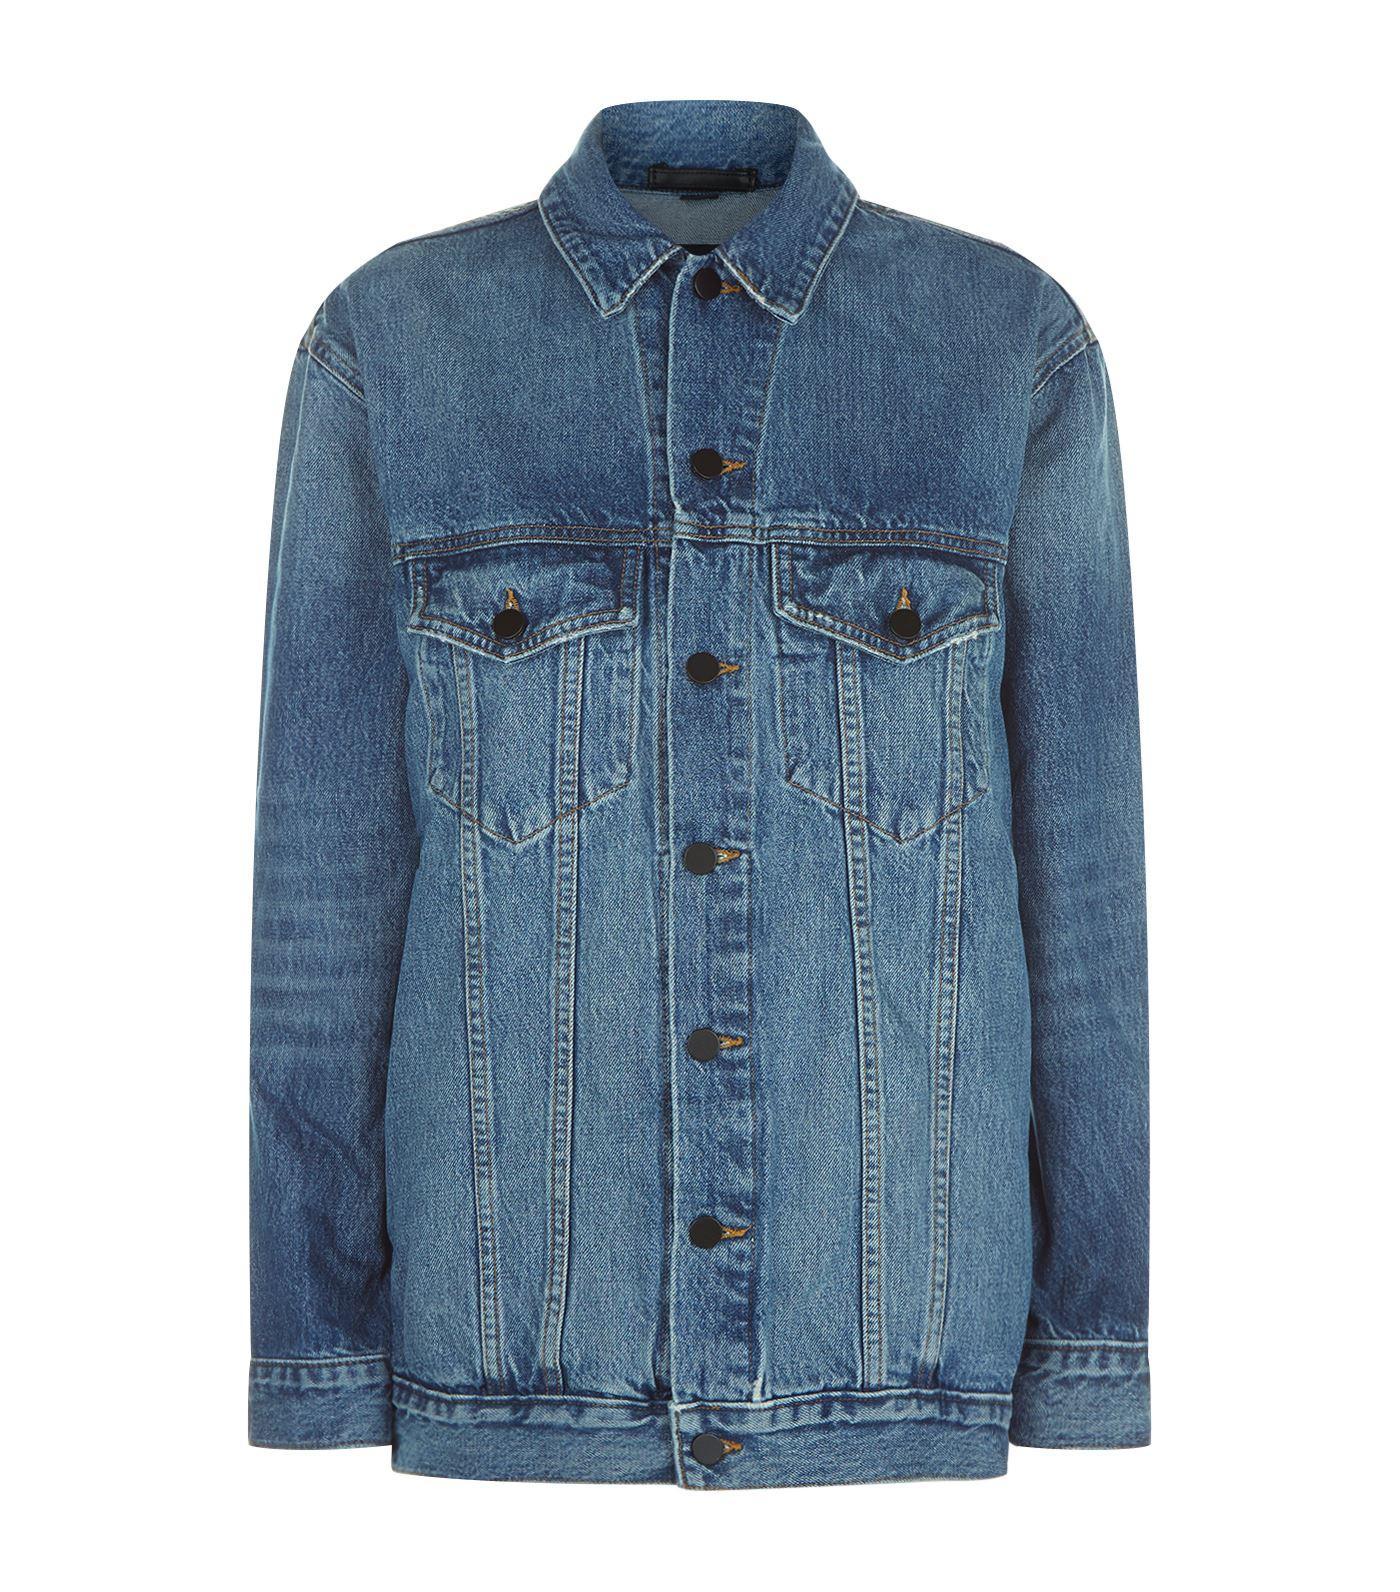 T By Alexander Wang Distressed Denim Jacket In Blue